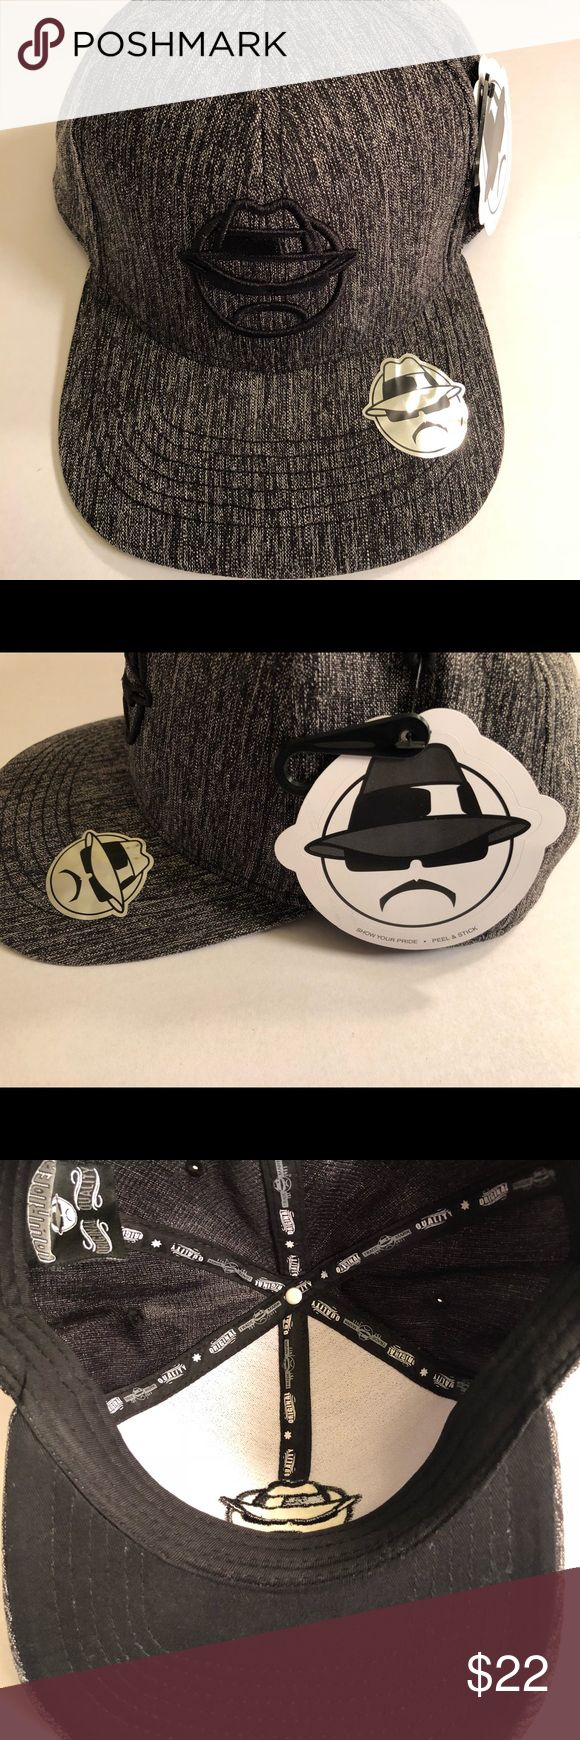 LOWRIDER Snap Back Flat Bill Cap NWT Men's. LOWRIDER Men's Snap Back Flat Bill Baseball cap. Color Gray and Black. Accessories Hats